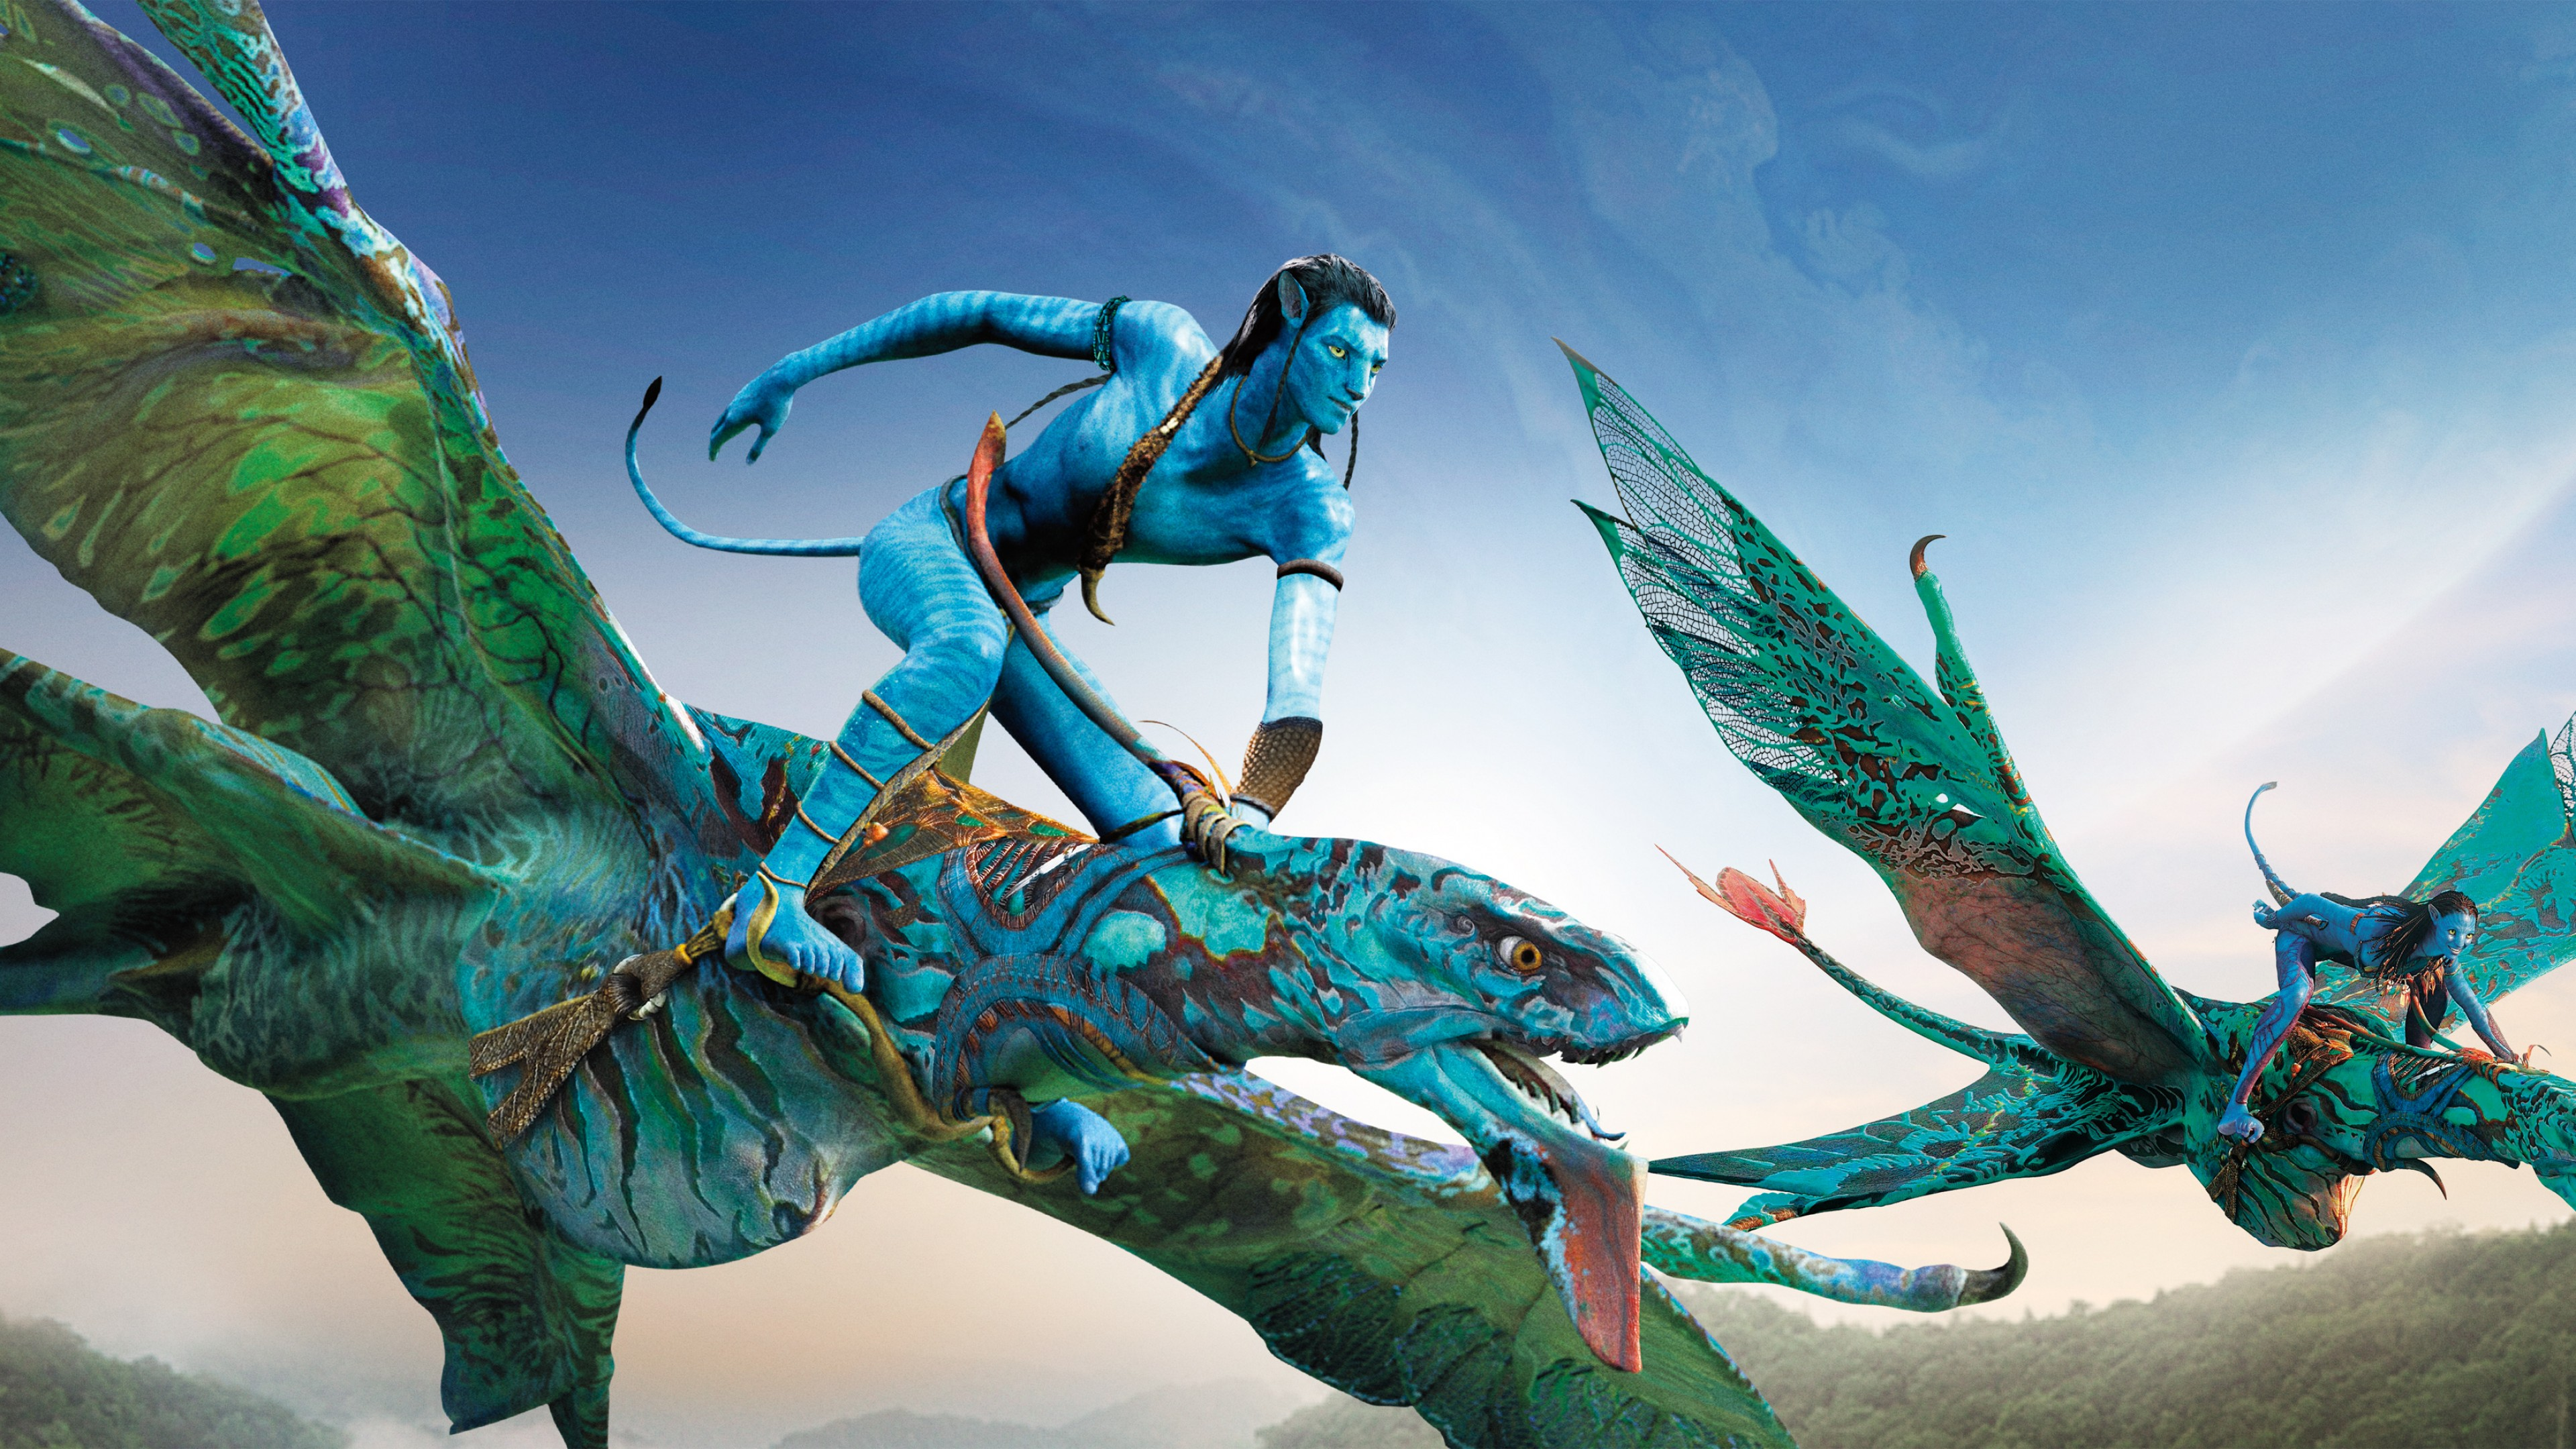 Wallpaper Neytiri Seze Avatar Hd Movies 4115: 4K Avatar Wallpapers High Quality